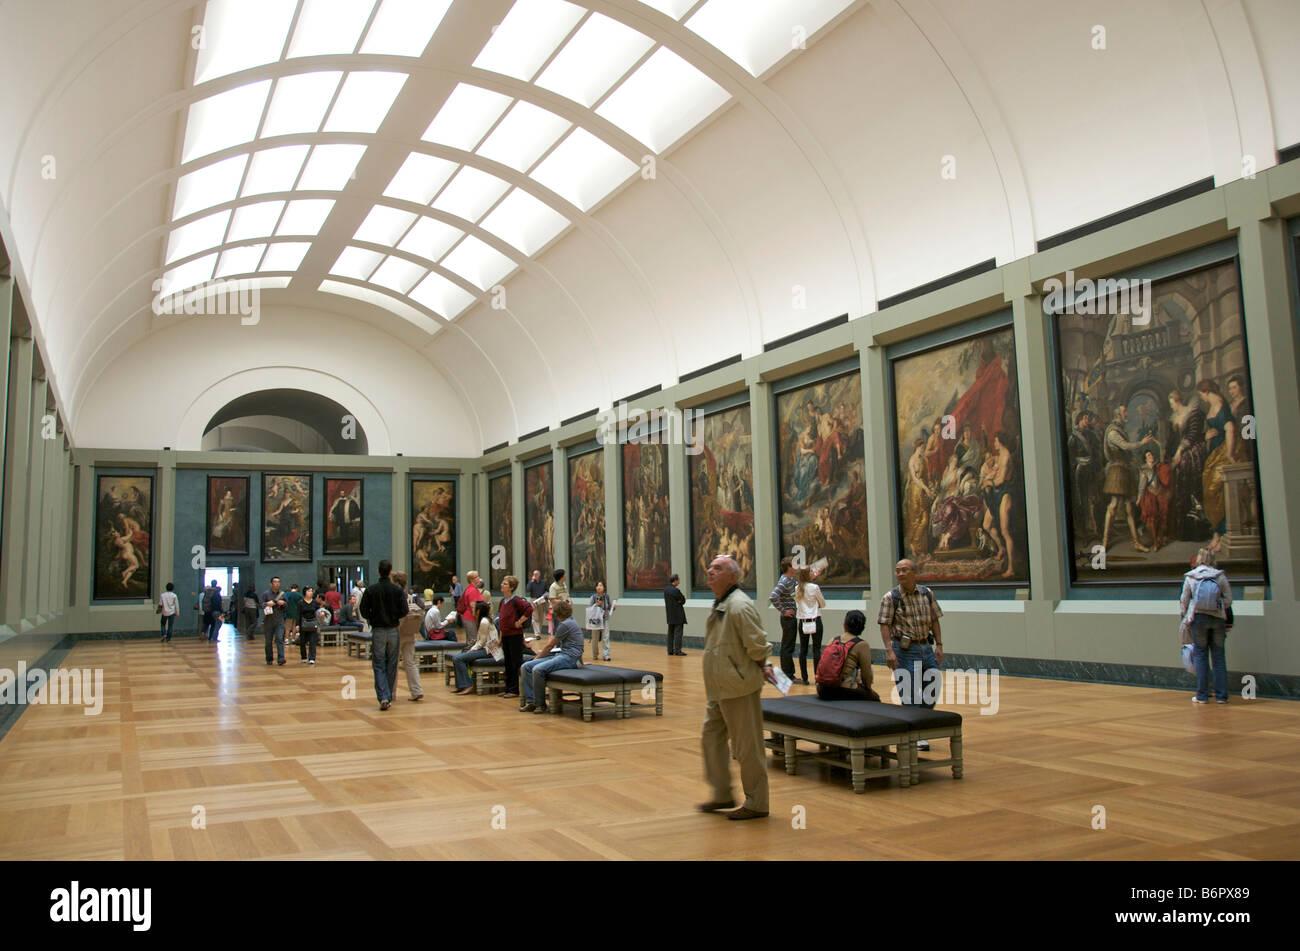 Louvre, Paris, France - interior - inside the art gallery - Stock Image